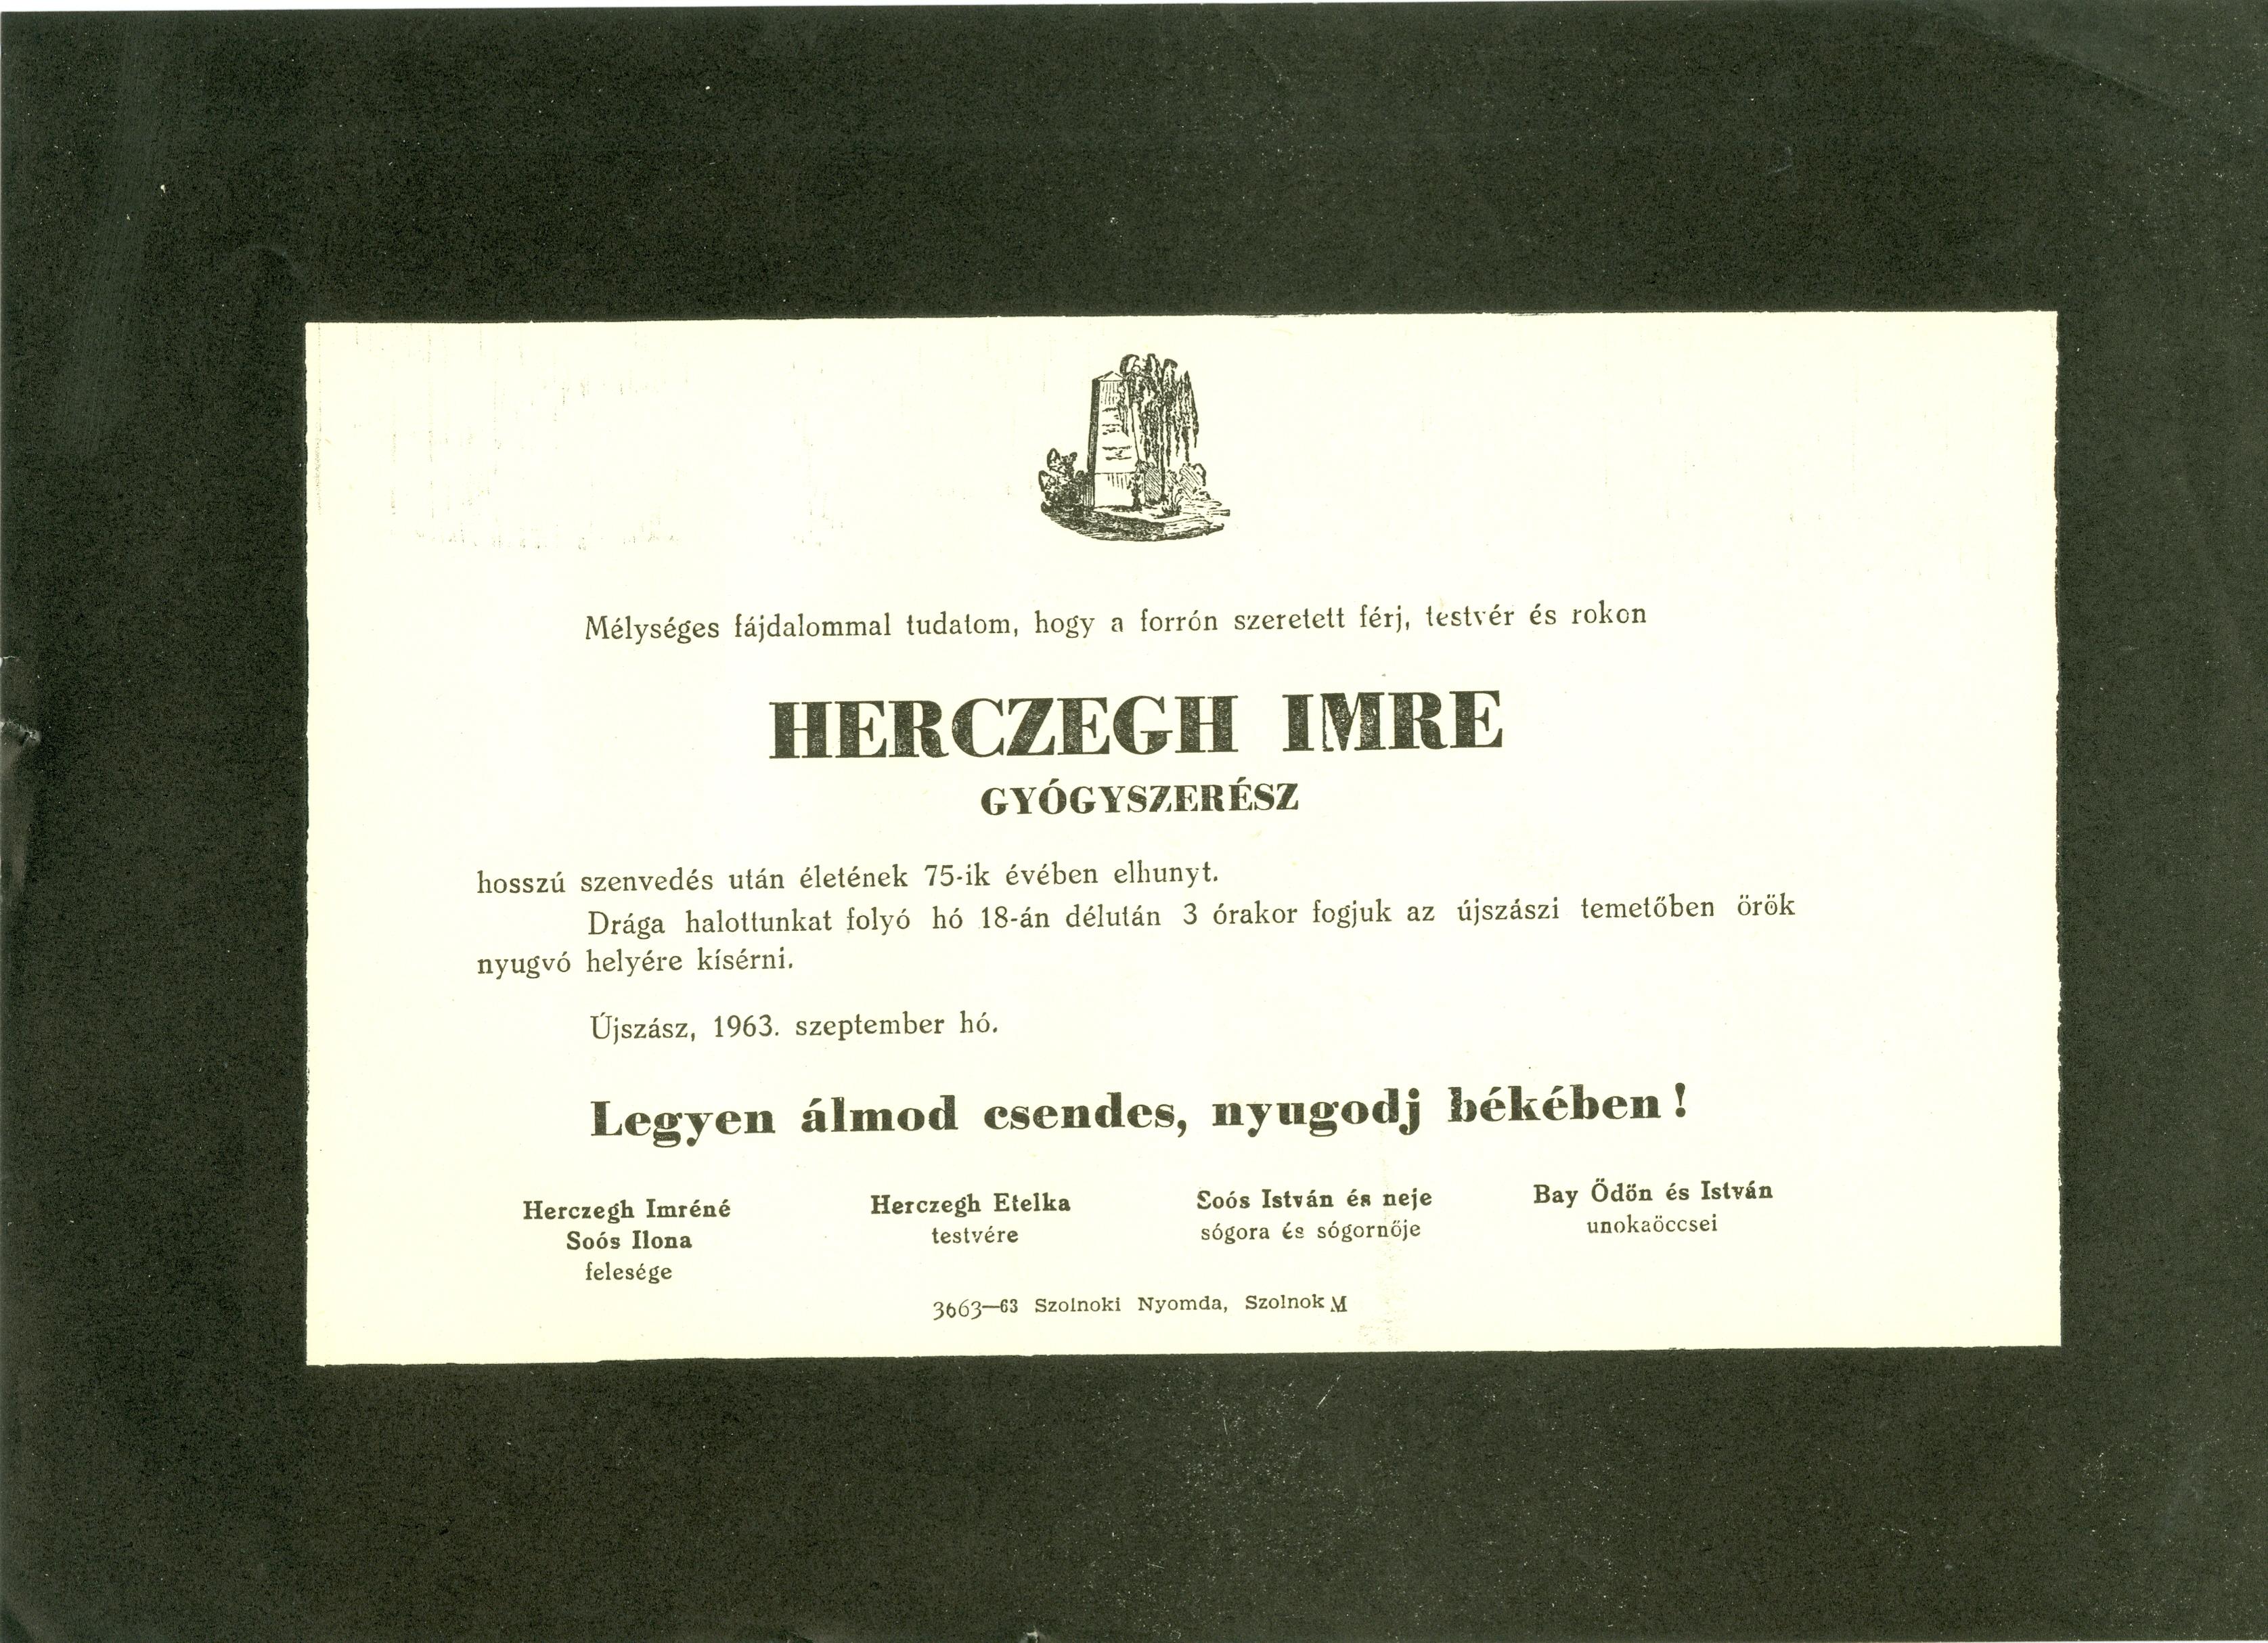 Herczeg Imre